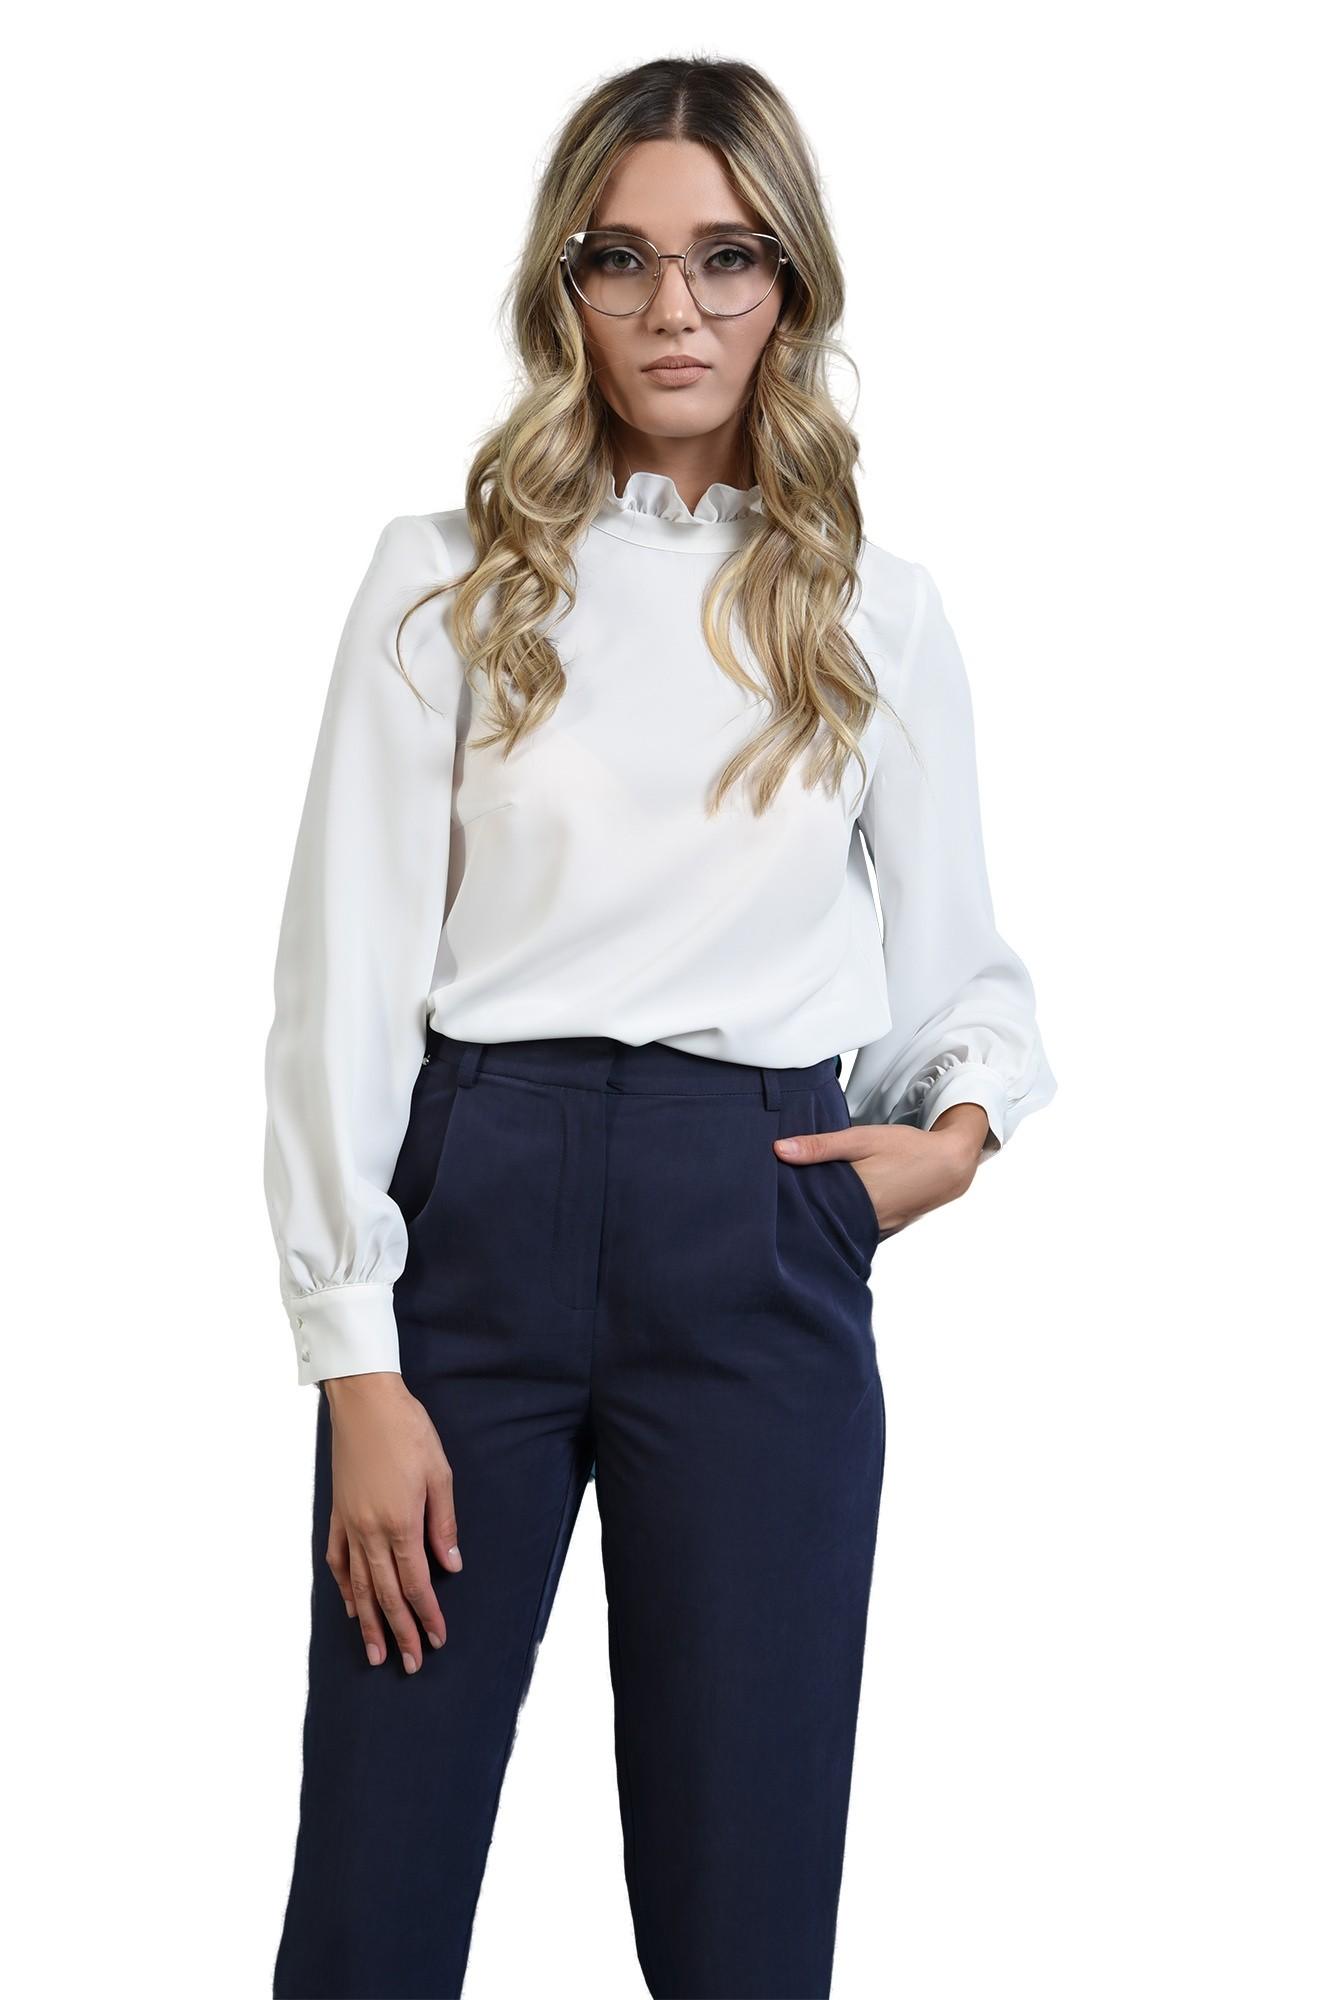 3 - pantaloni cu buzunare laterale, tigareta